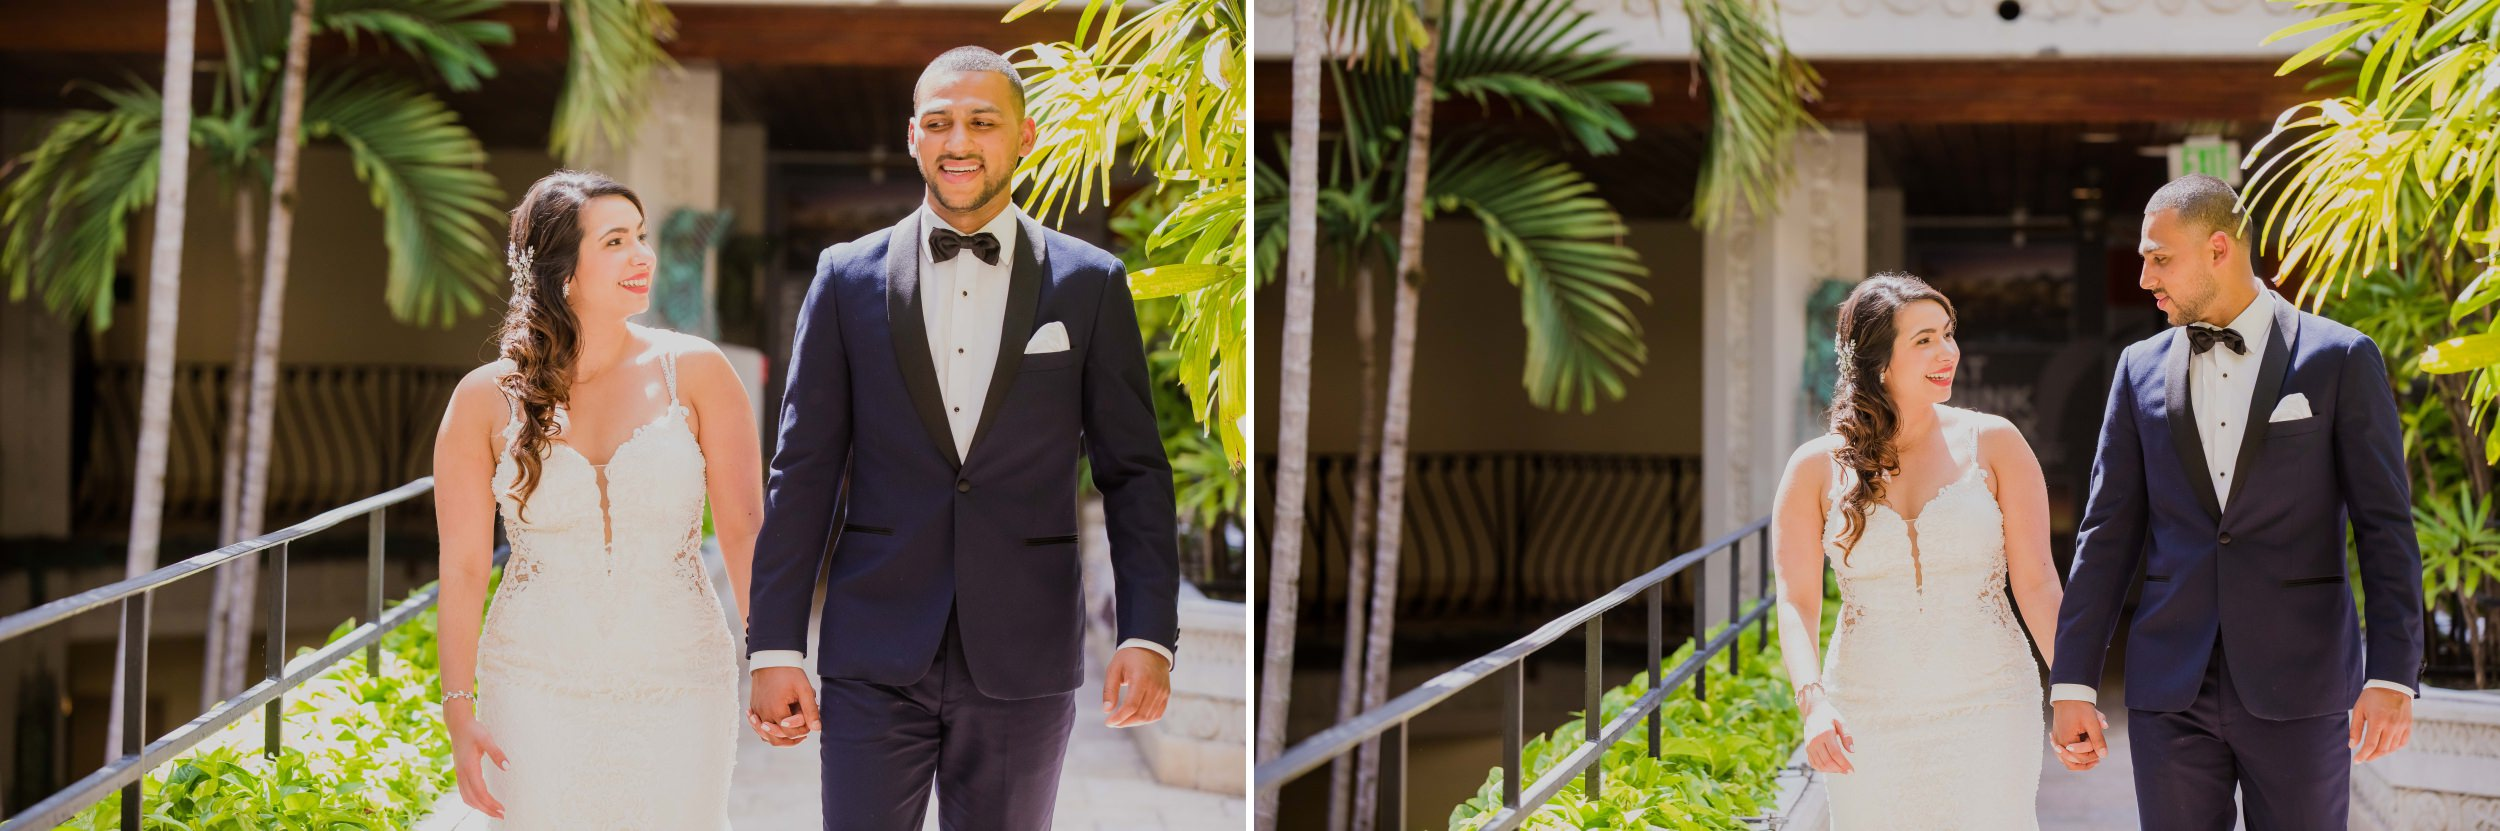 Wedding - Rusty Pelican - Key Biscayne - Santy Martinez Photography 20.jpg